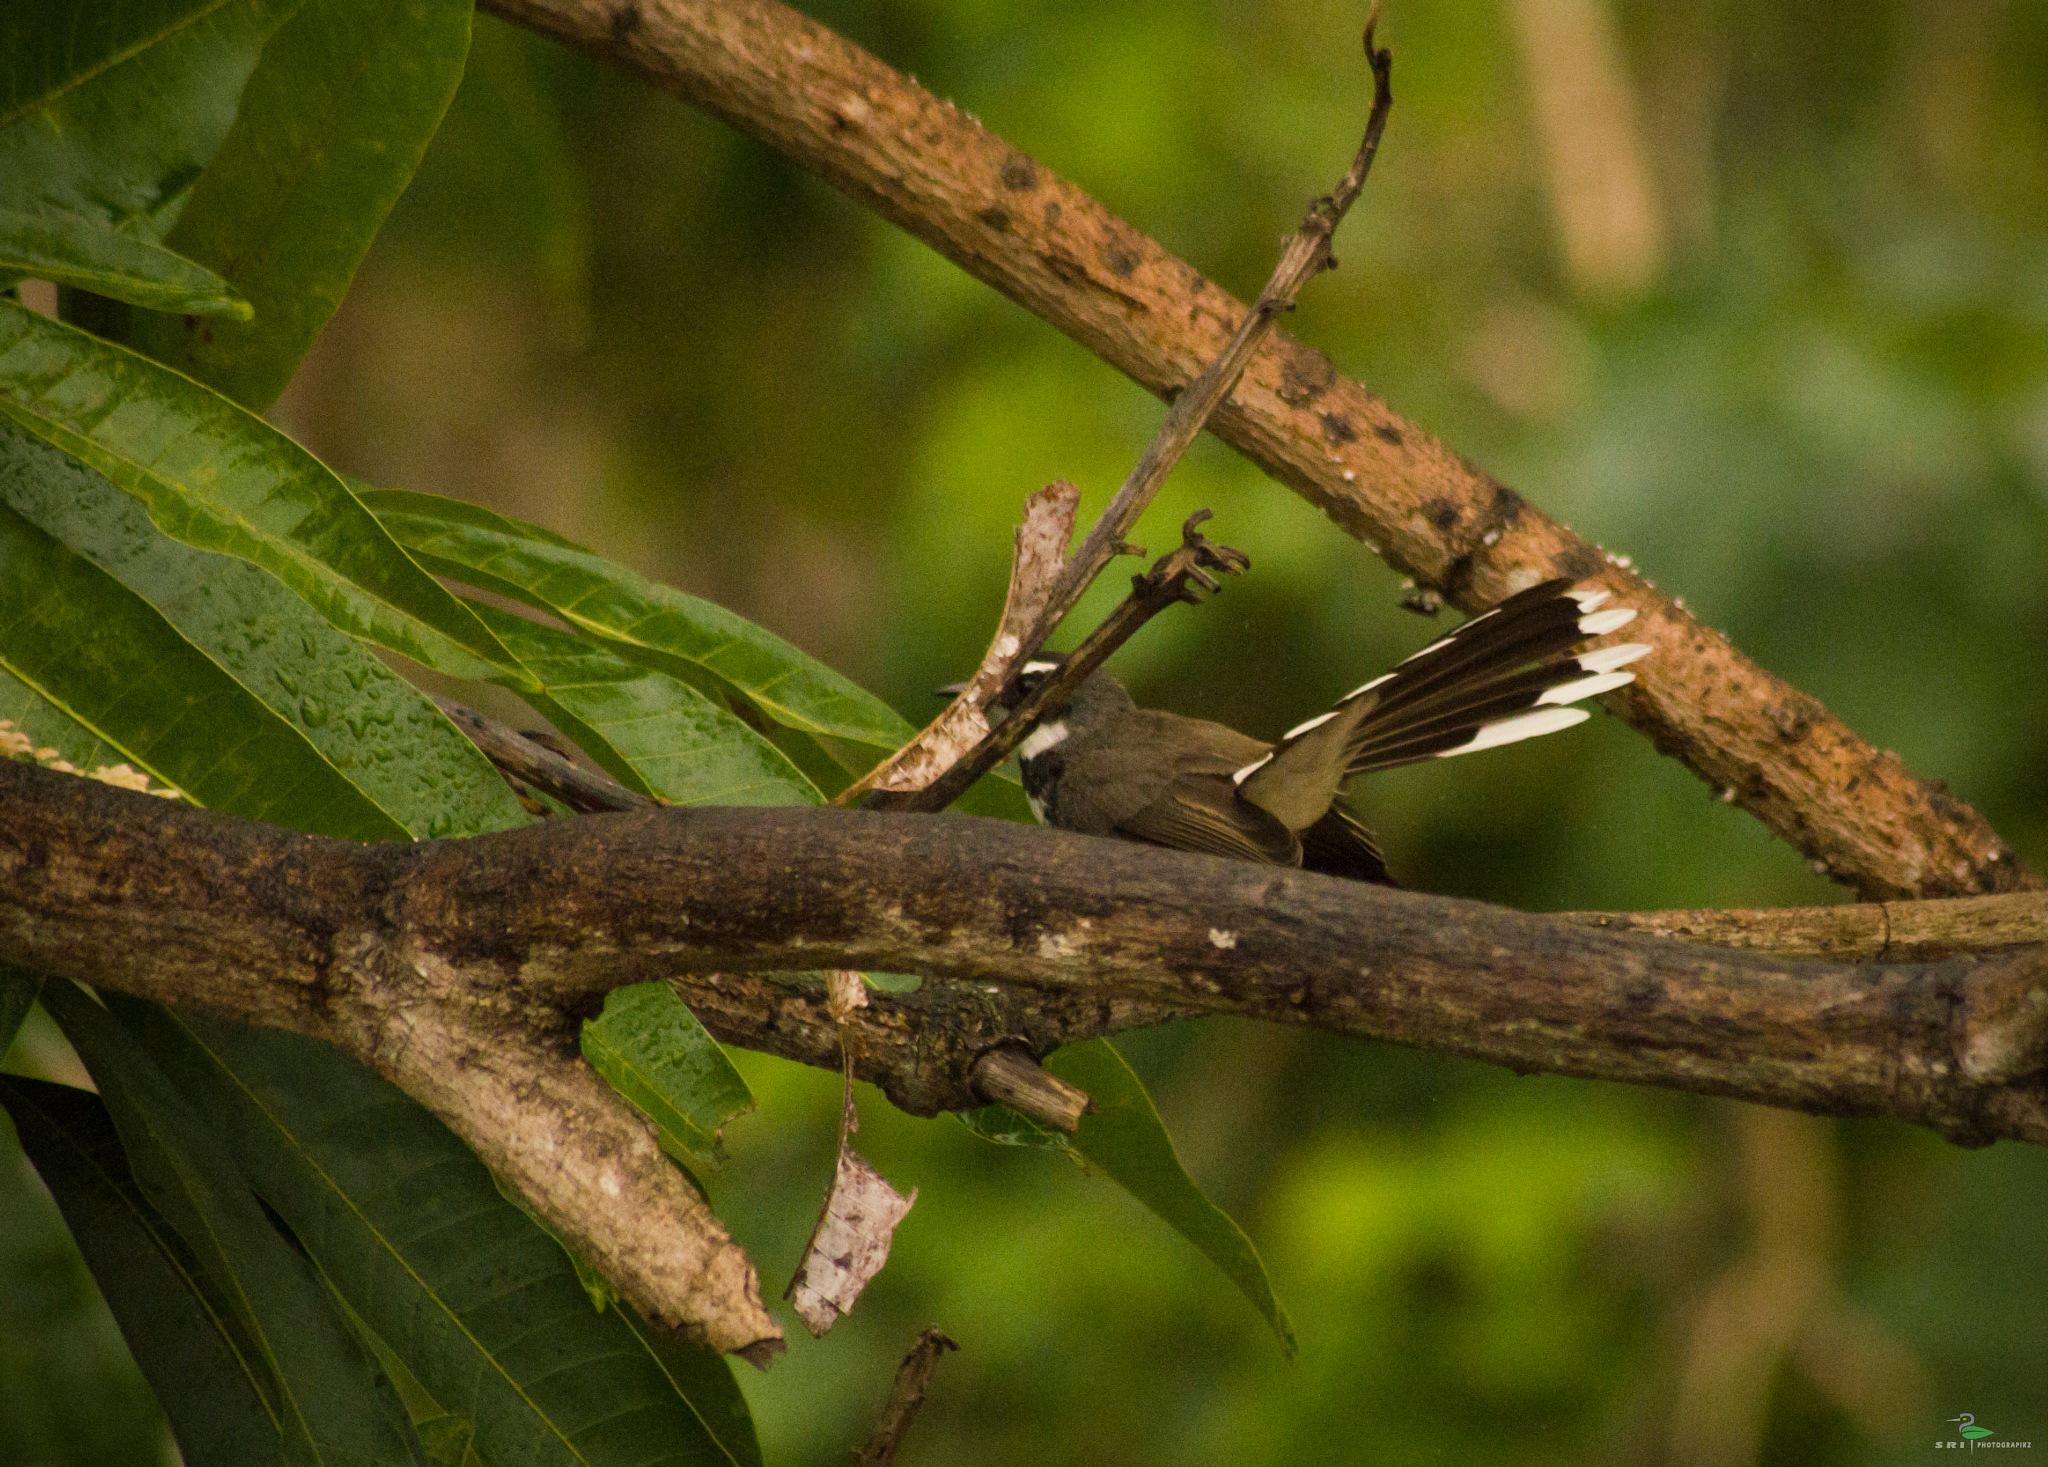 Fantail fly catcher by Jawahar srinath